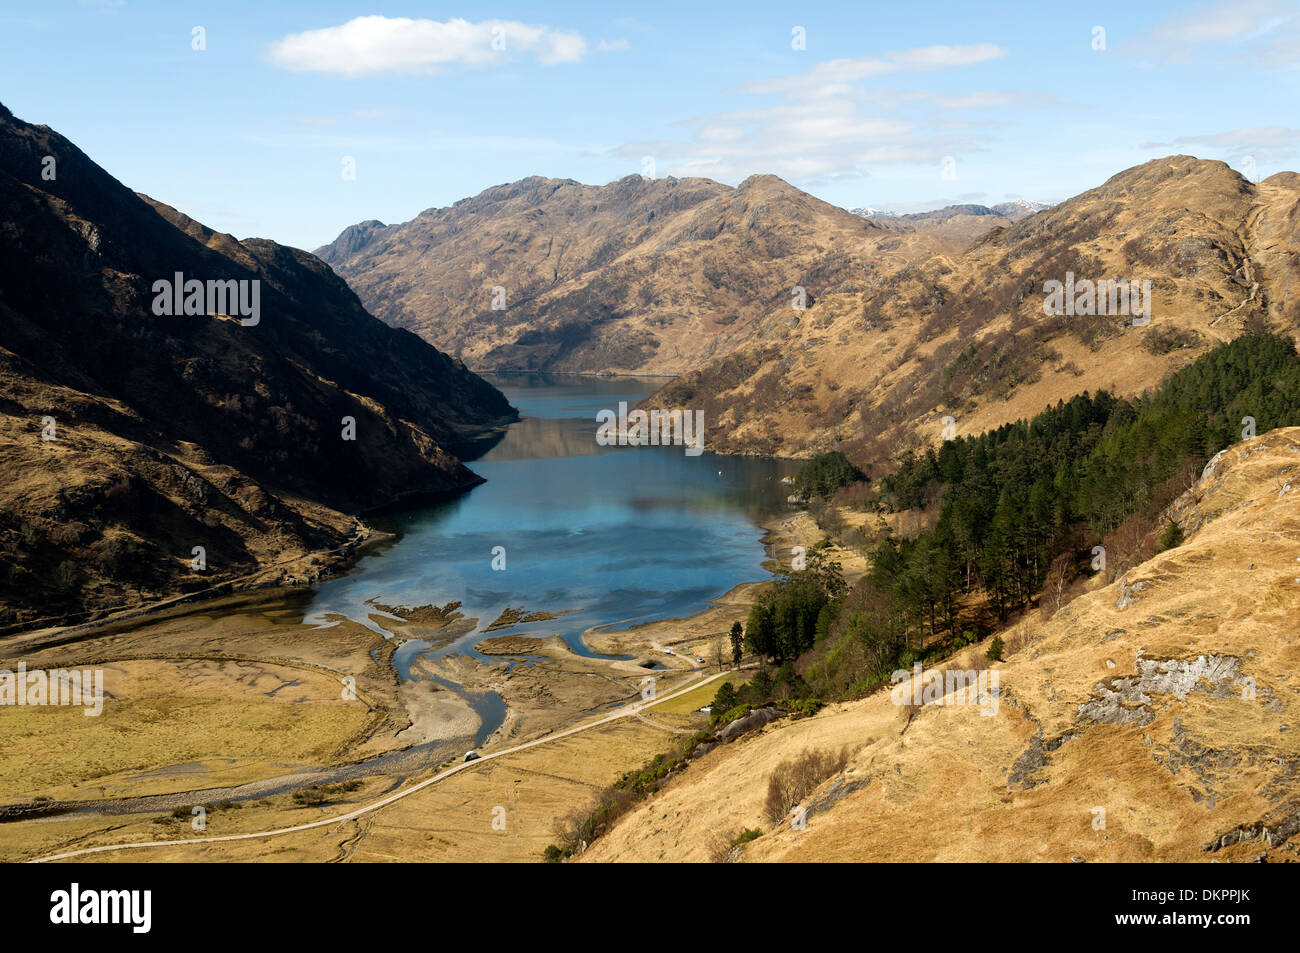 The Druim Fada ridge over Loch Hourn, from Kinloch Hourn, Highland region, Scotland, UK. Stock Photo